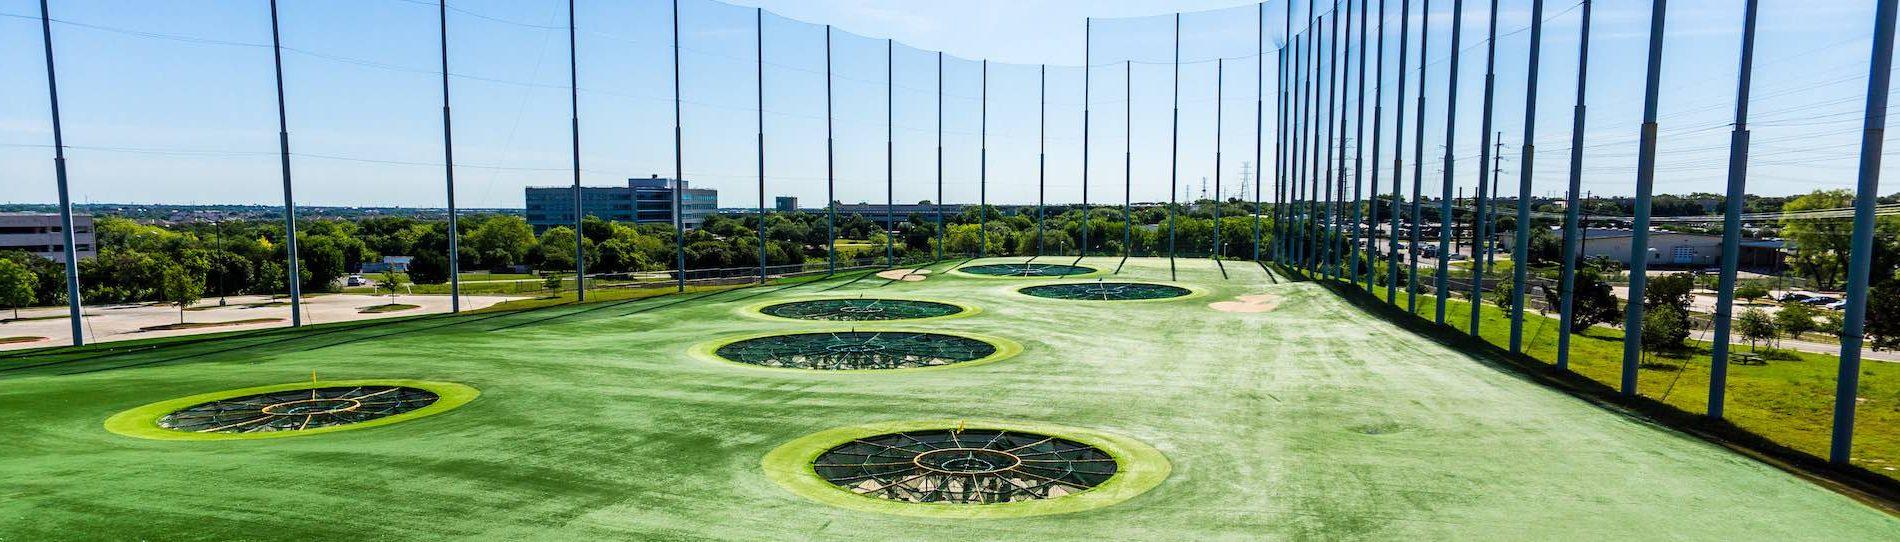 top golf range and goals